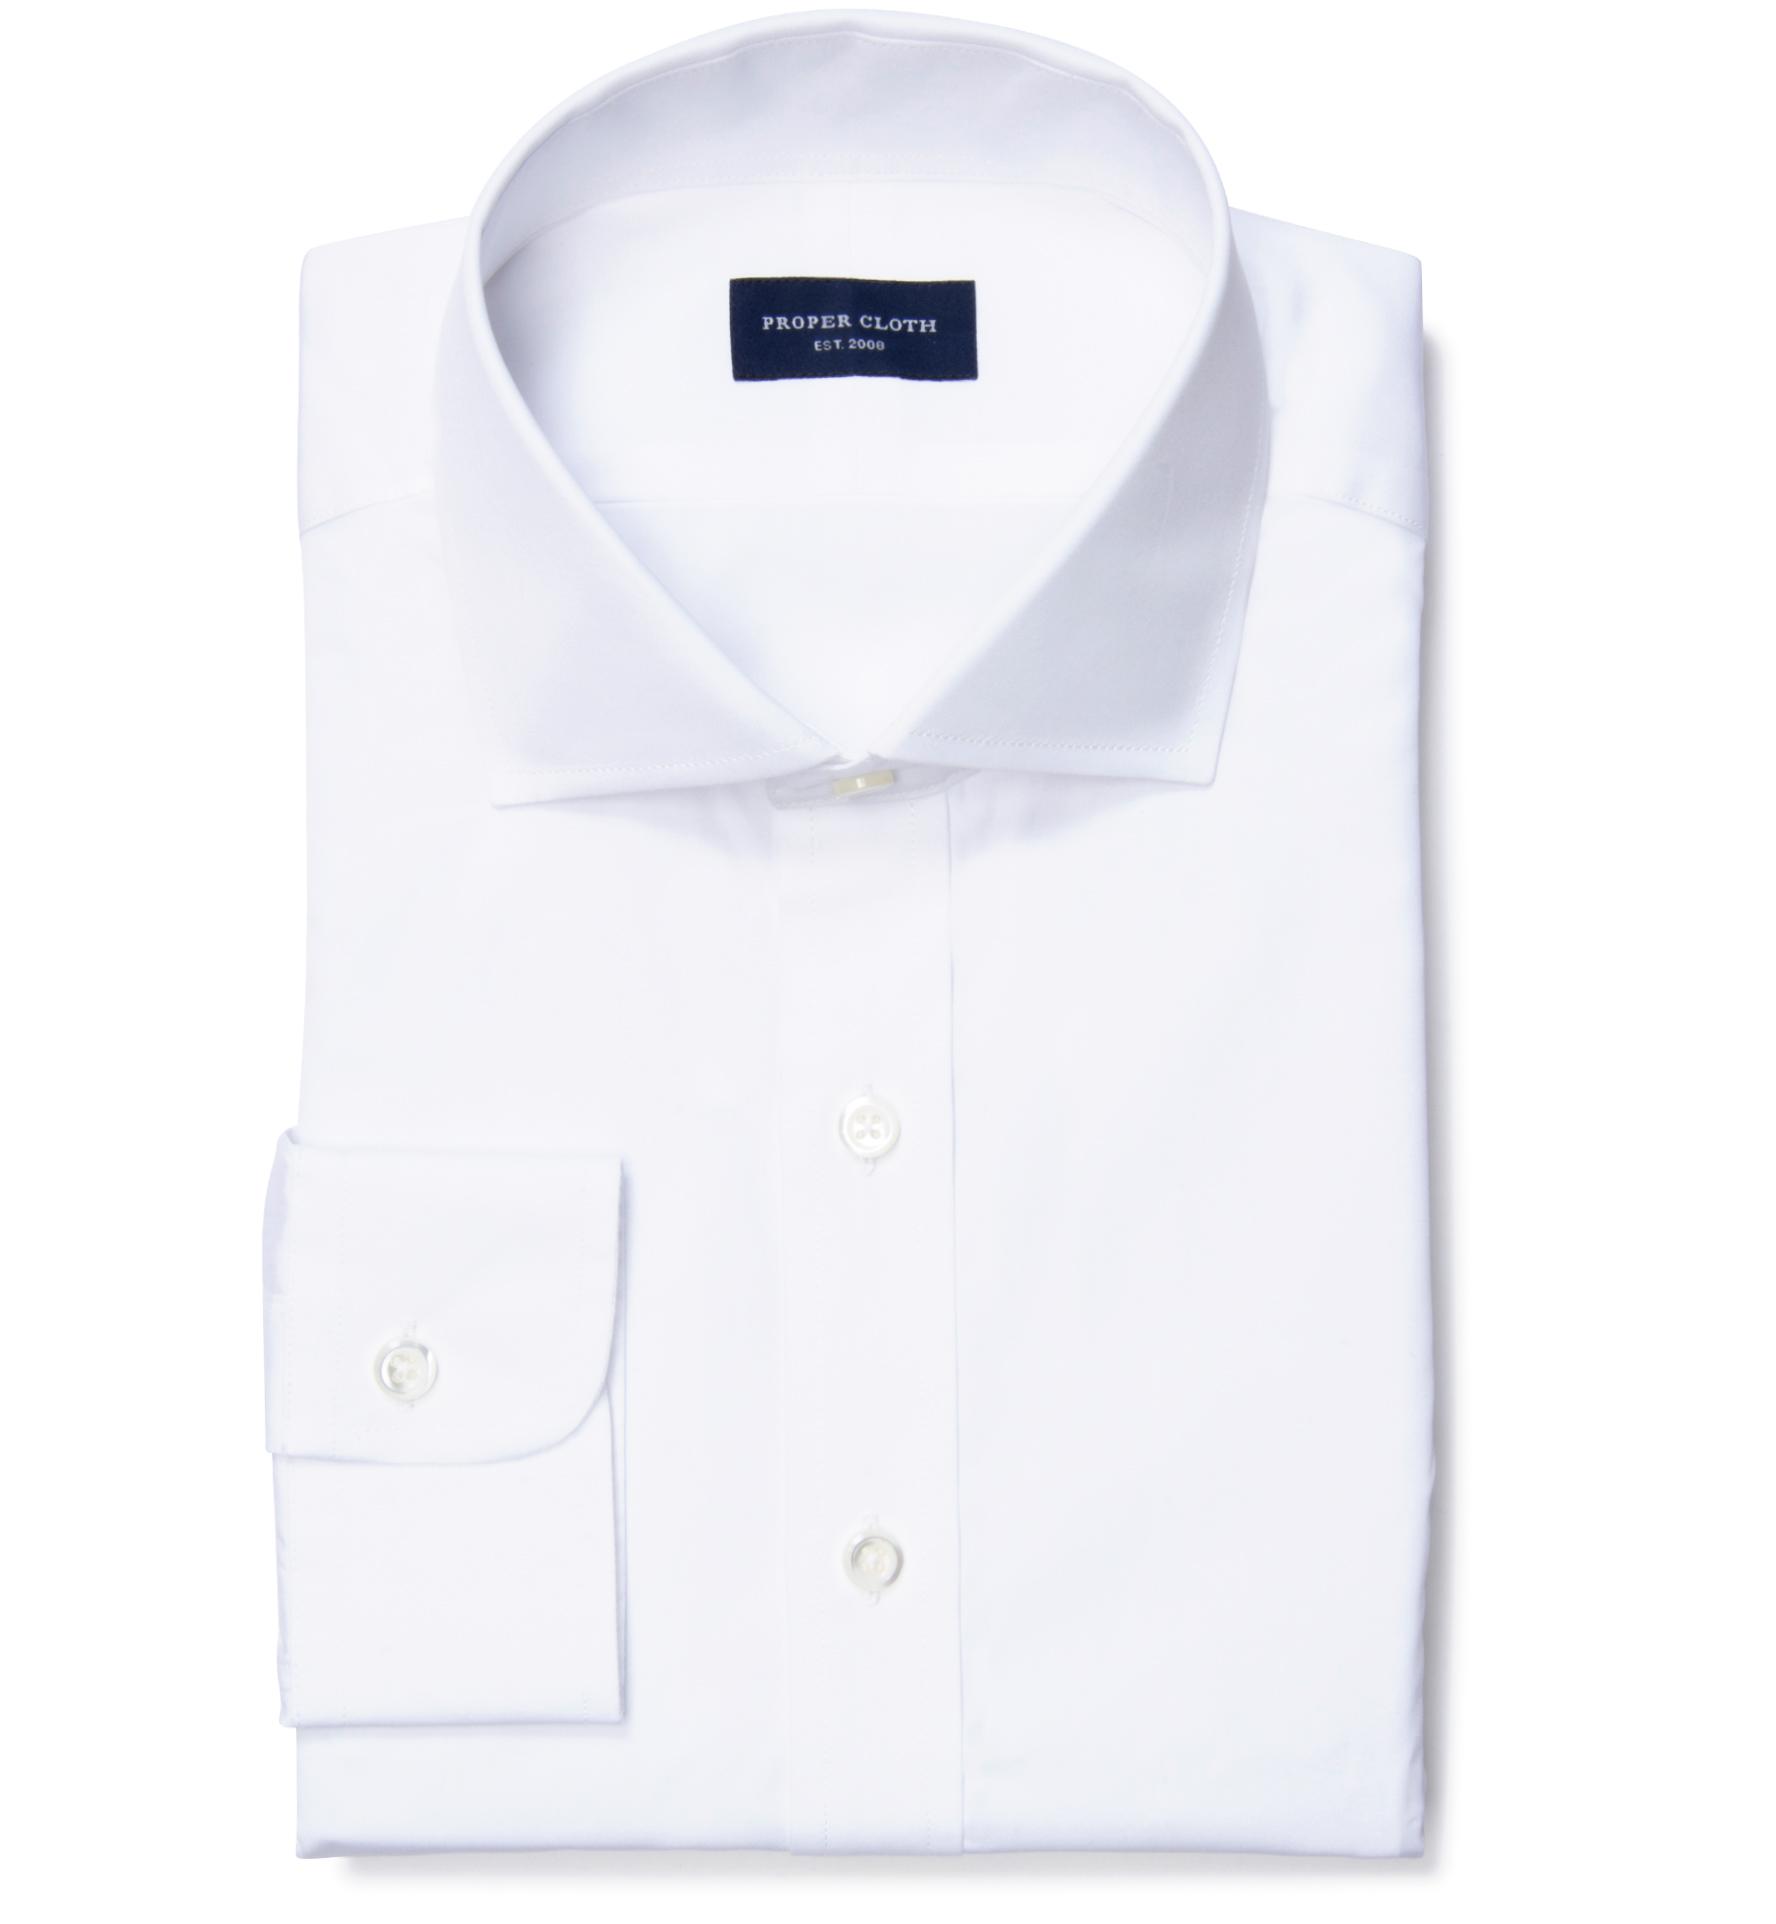 Thomas Mason White Luxury Broadcloth Tailor Made Shirt By